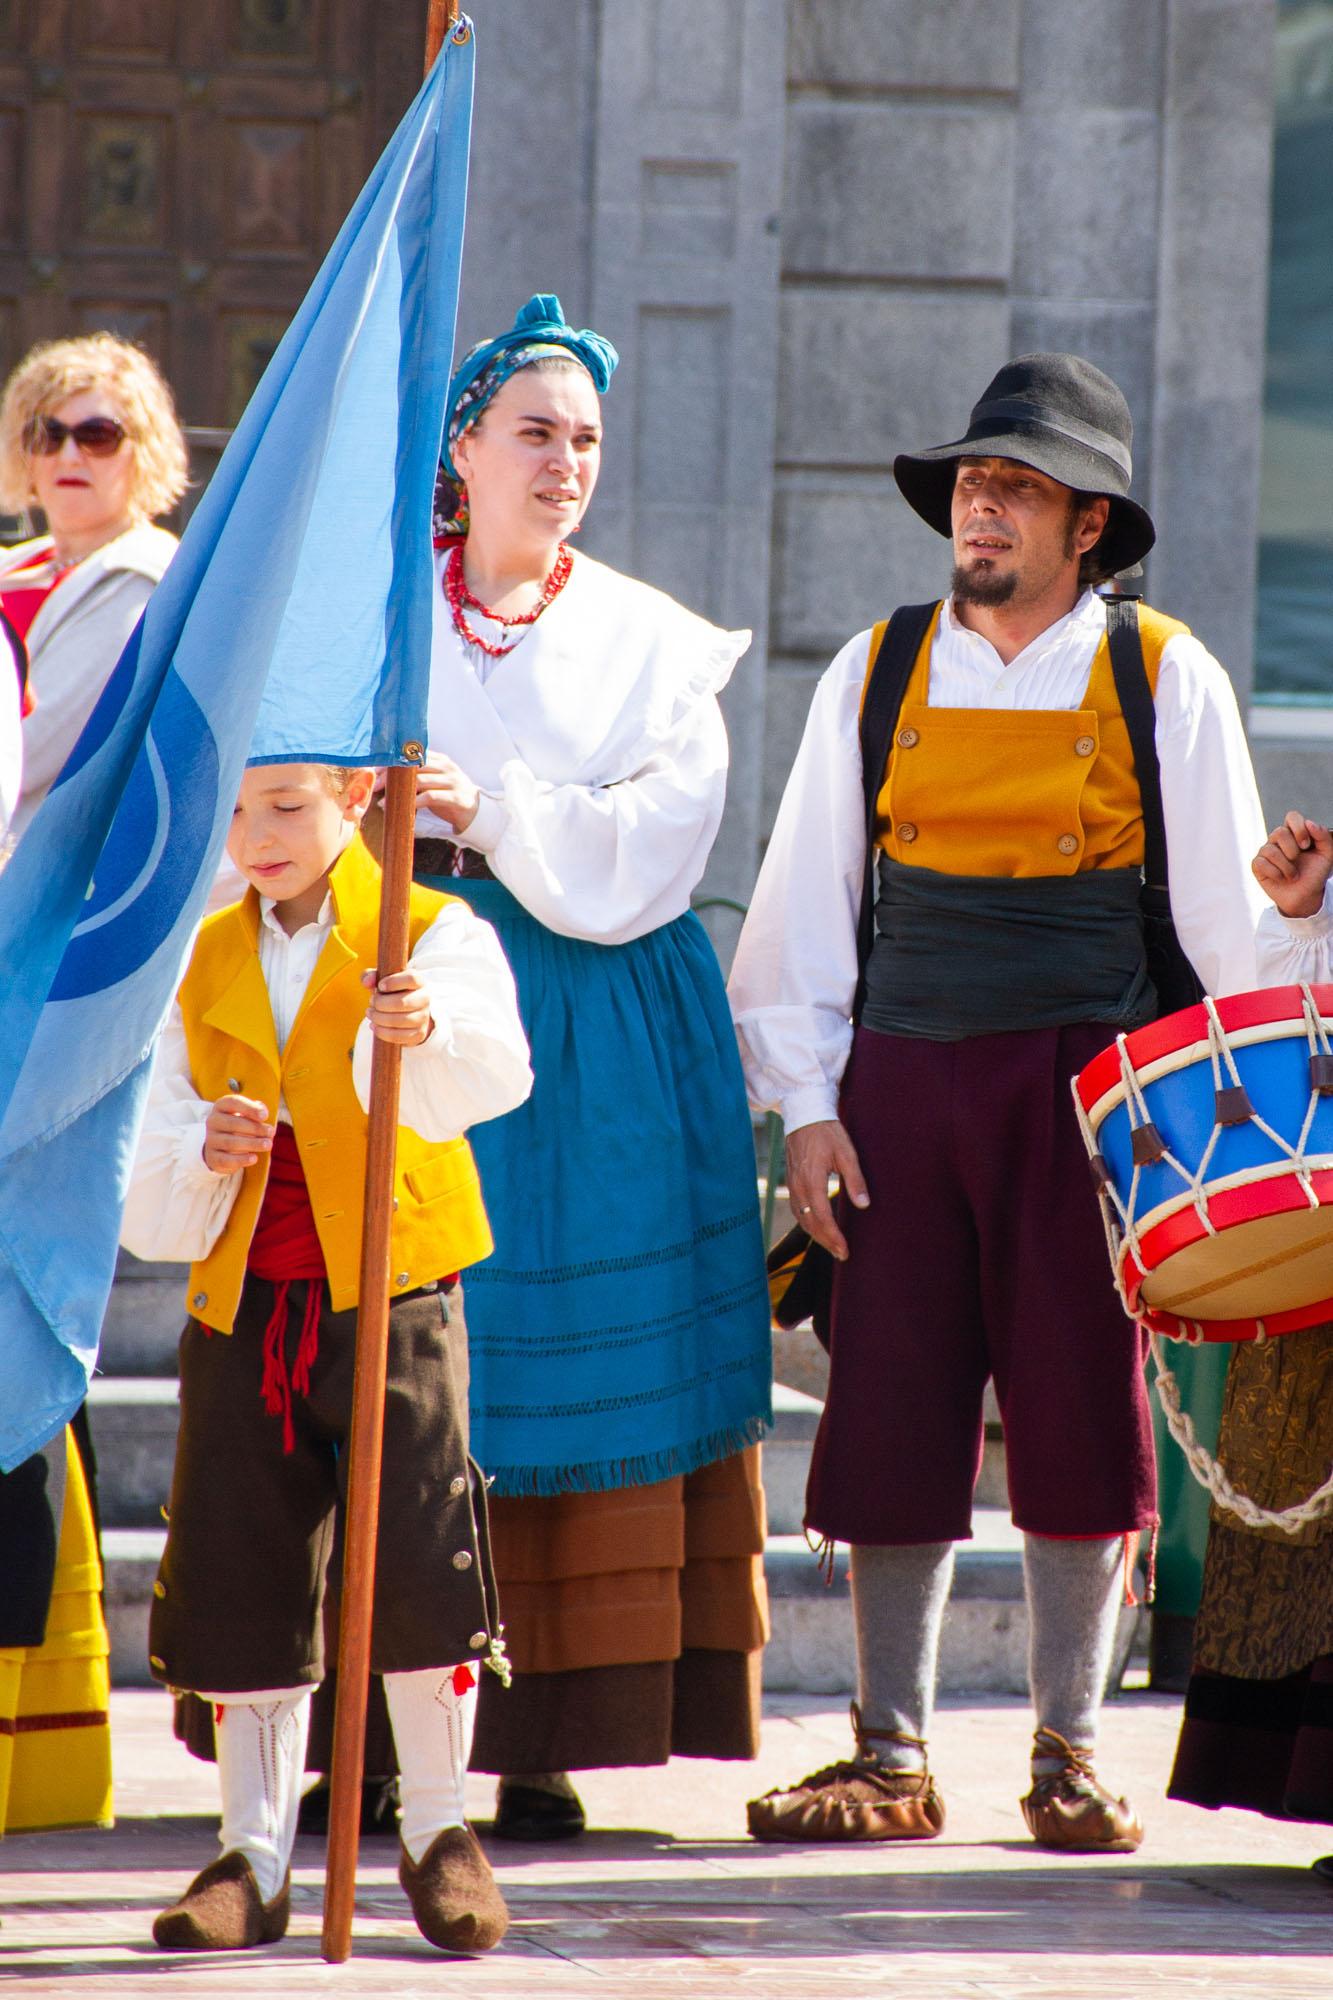 Traditions of Asturias